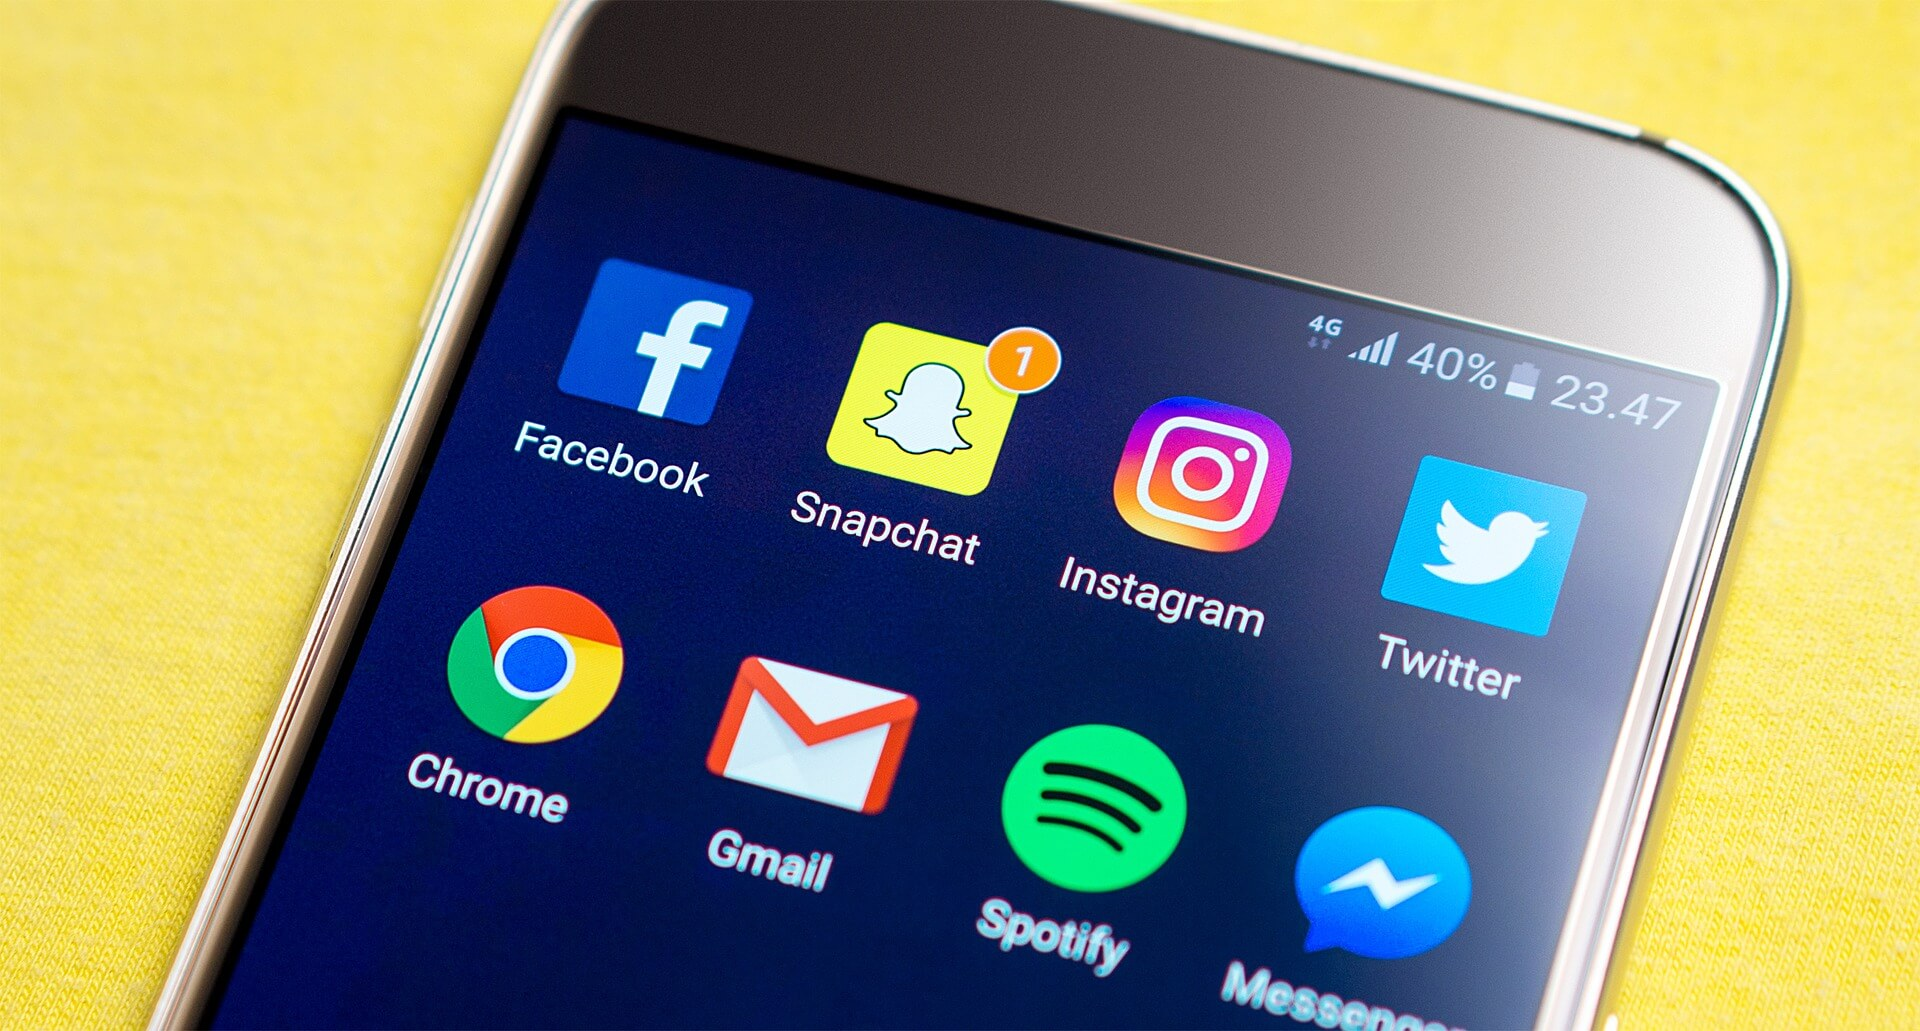 pametni telefon Upravljanje Družbenih Medijev